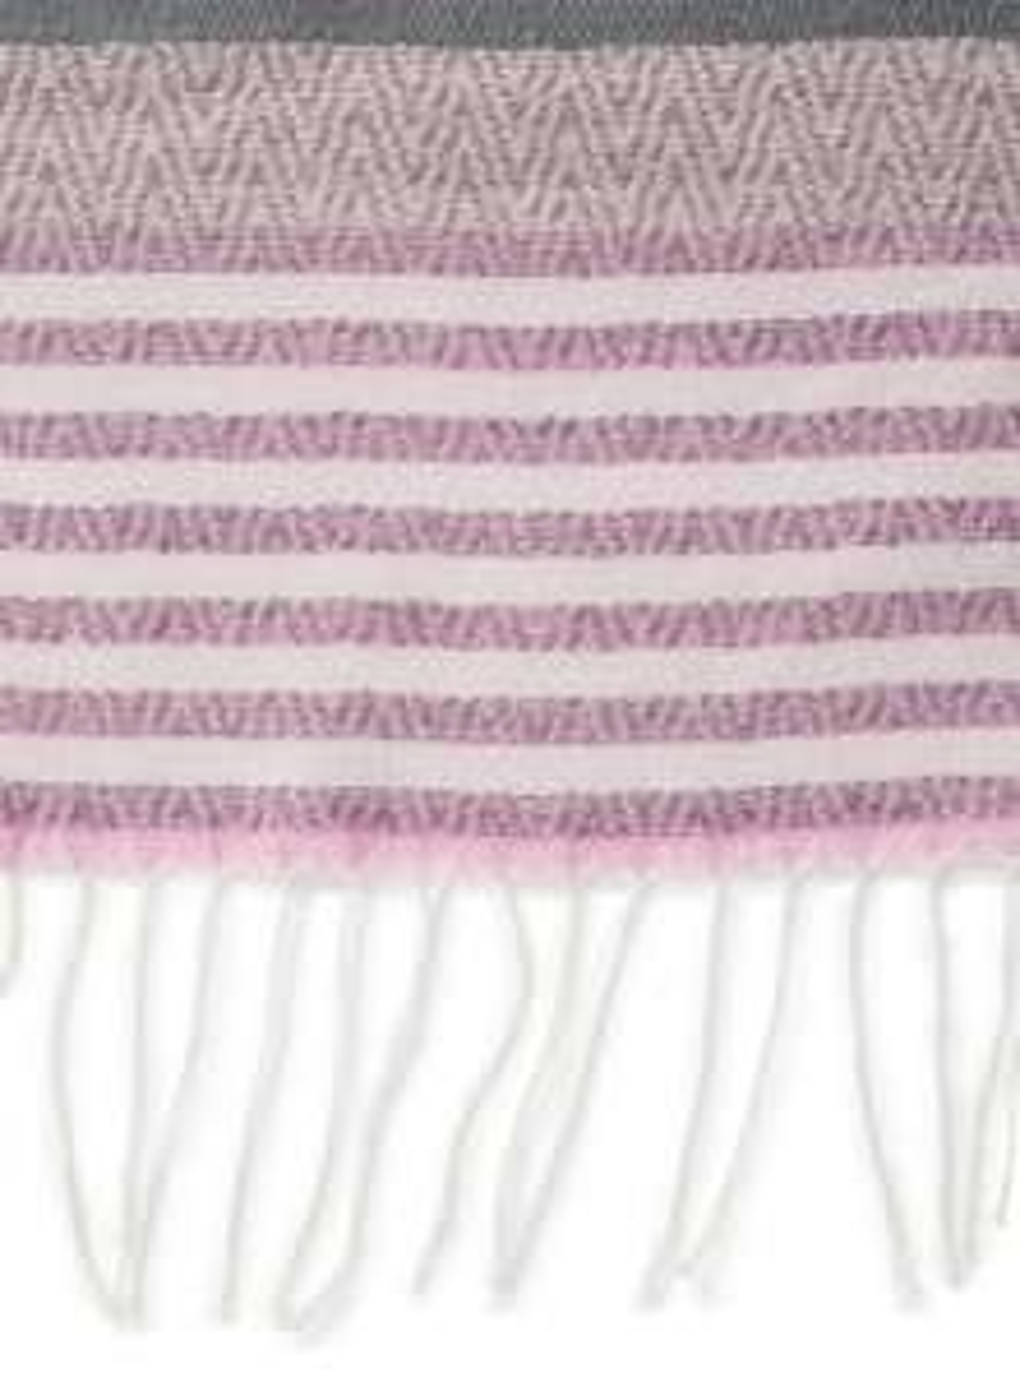 Grey Pink Chevron Scarf £1.80 (was £16.00) using code @ Miss Selfridges - Free C+C